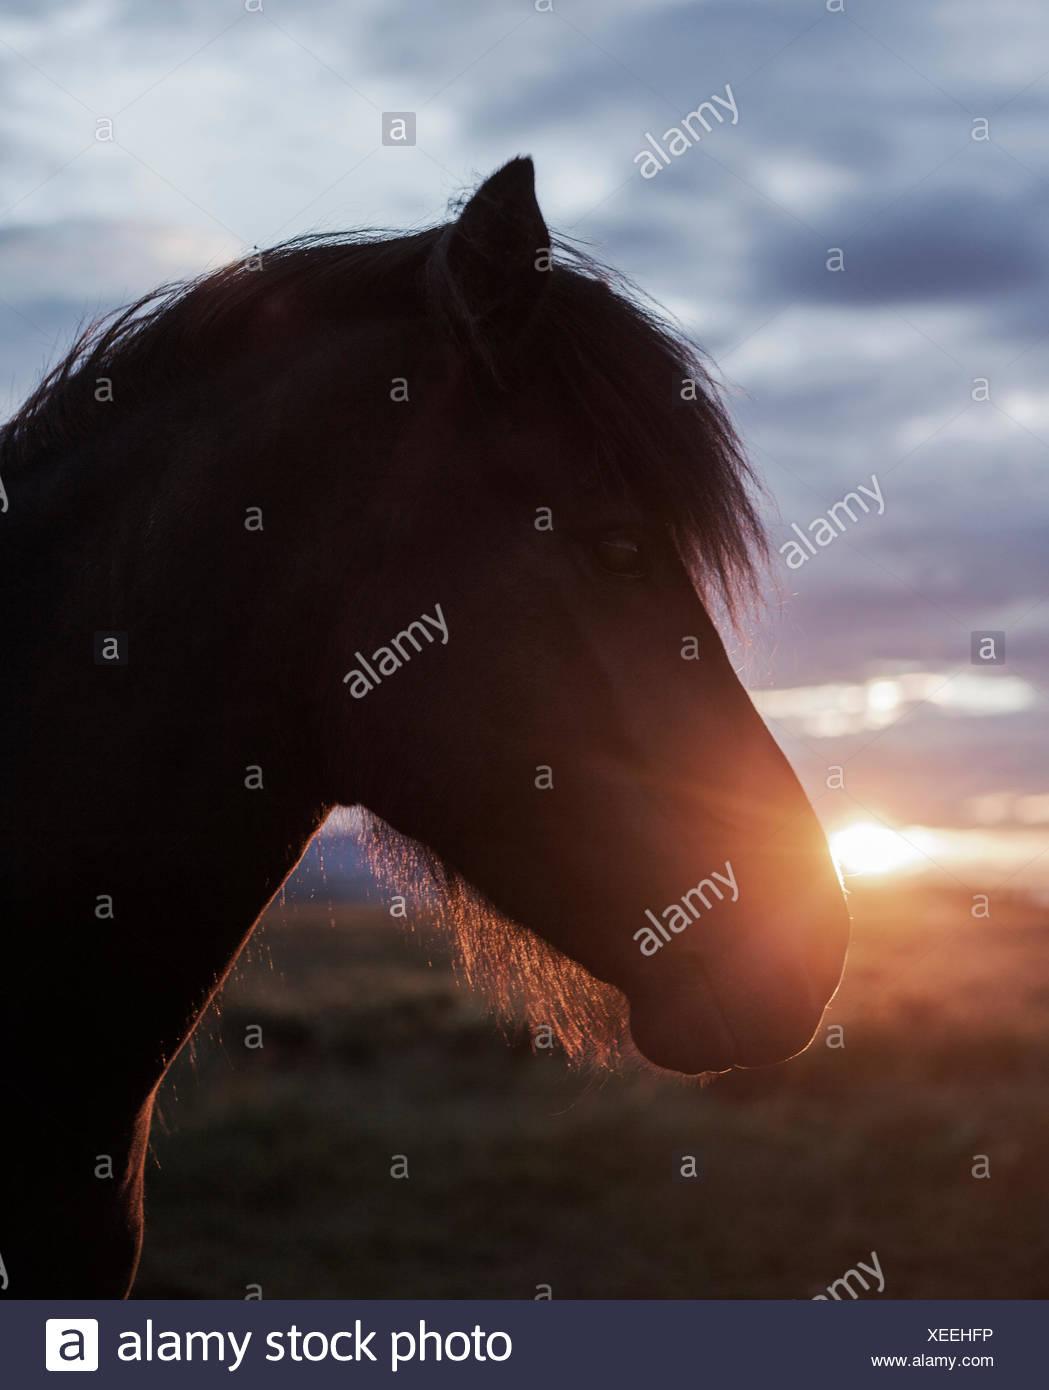 Iceland, Reykjavik, Close-up of horse's head at sunset Stock Photo